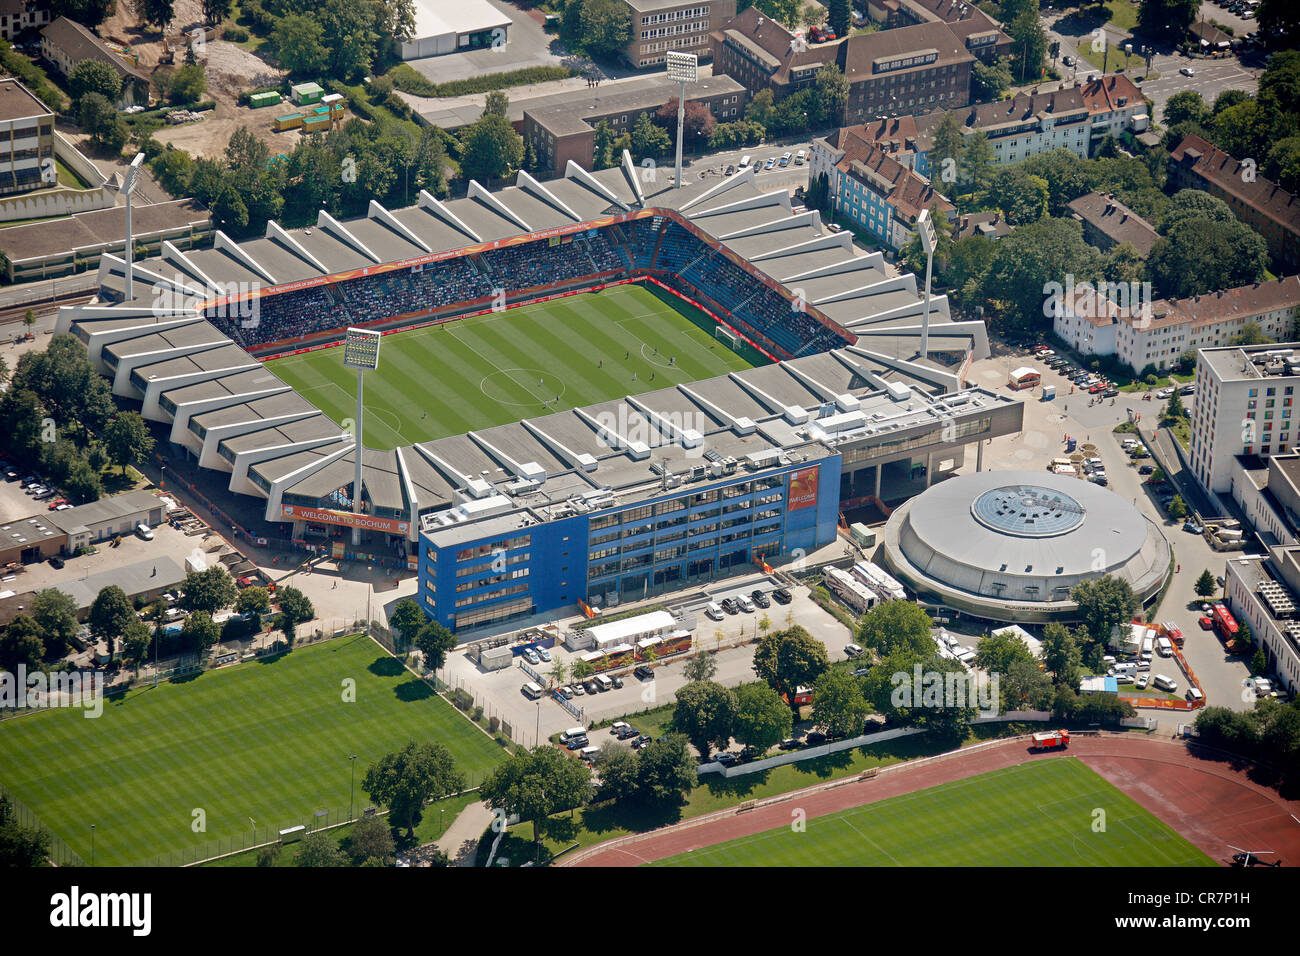 Aerial view, VfL-Stadion stadium, match Japan - New Zealand, FIFA Women's World Cup, Bochum, Ruhrgebiet region - Stock Image